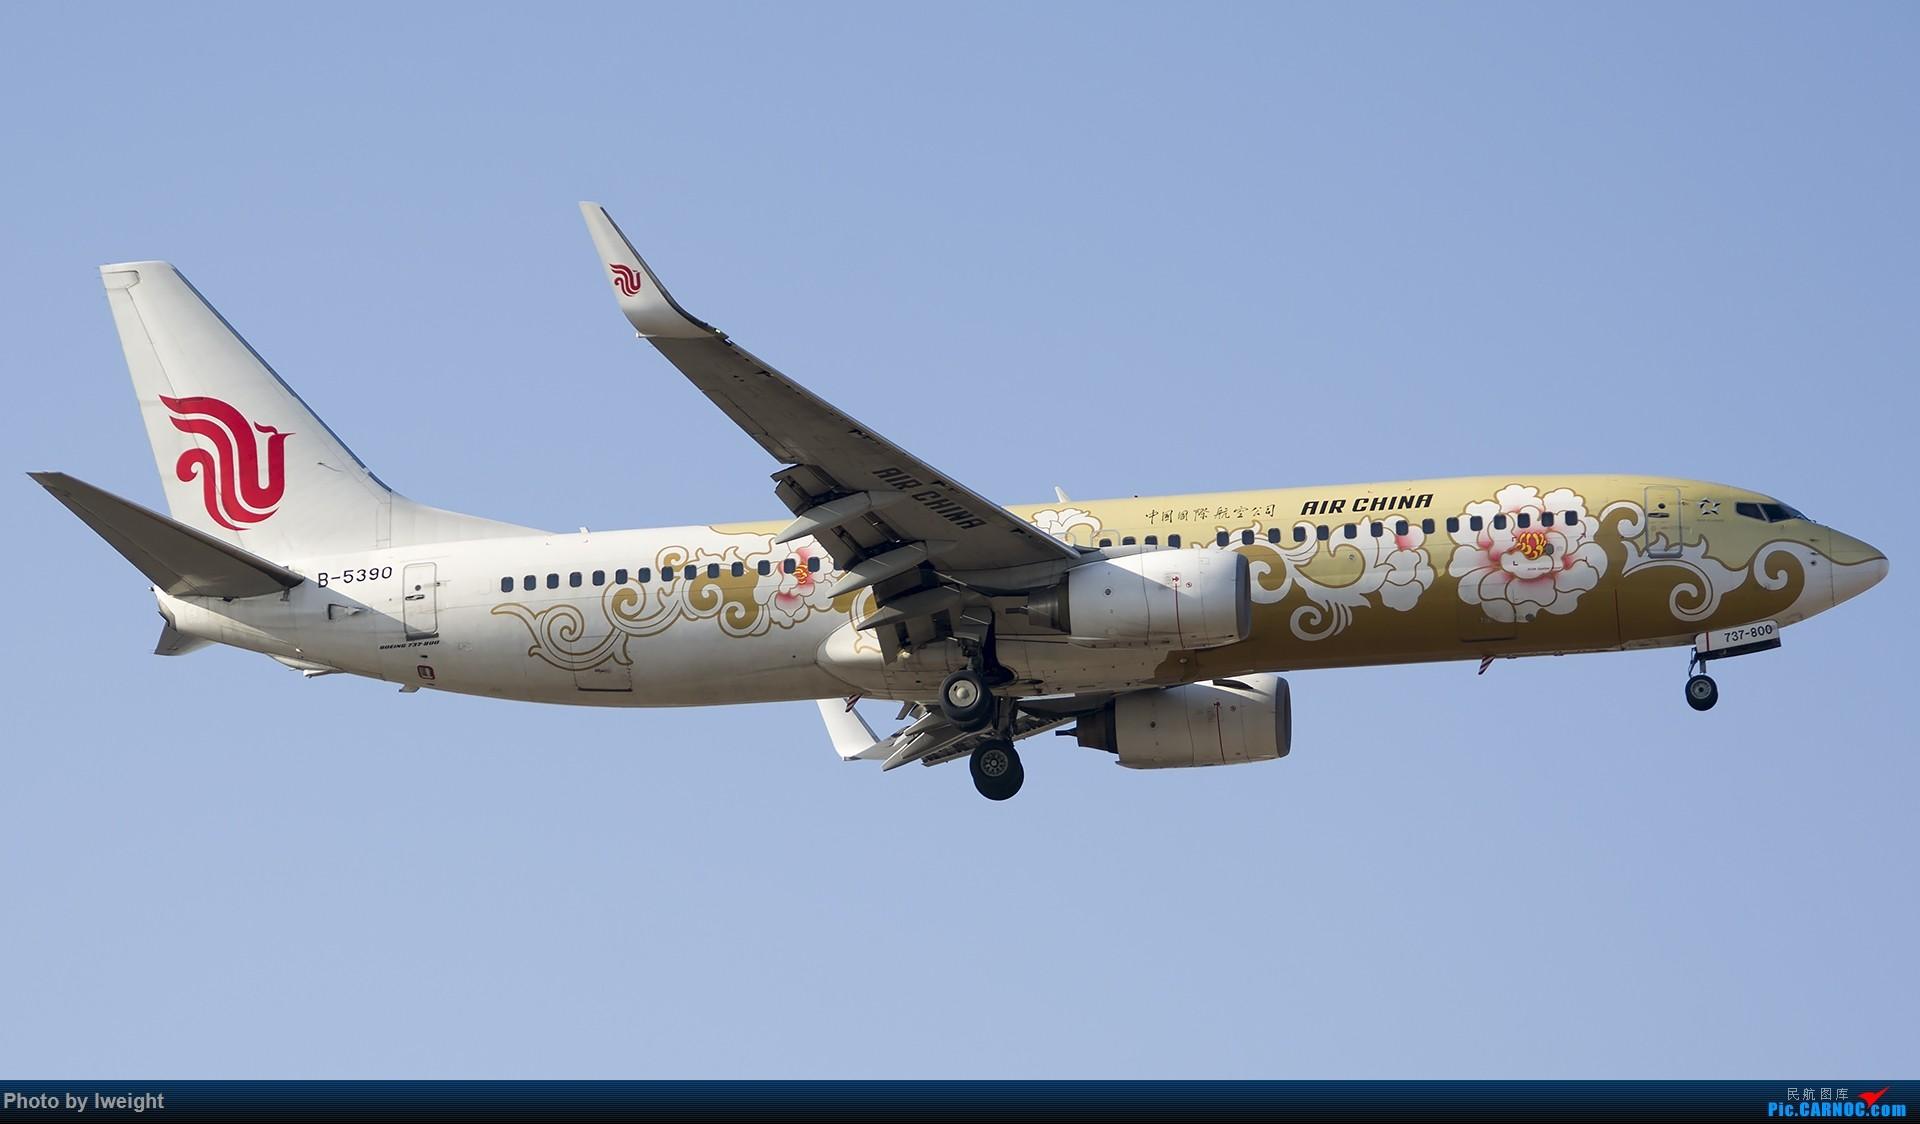 Re:[原创]庆祝升级777,发上今天在首都机场拍的所有飞机【2014-12-14】 BOEING 737-800 B-5390 中国北京首都国际机场